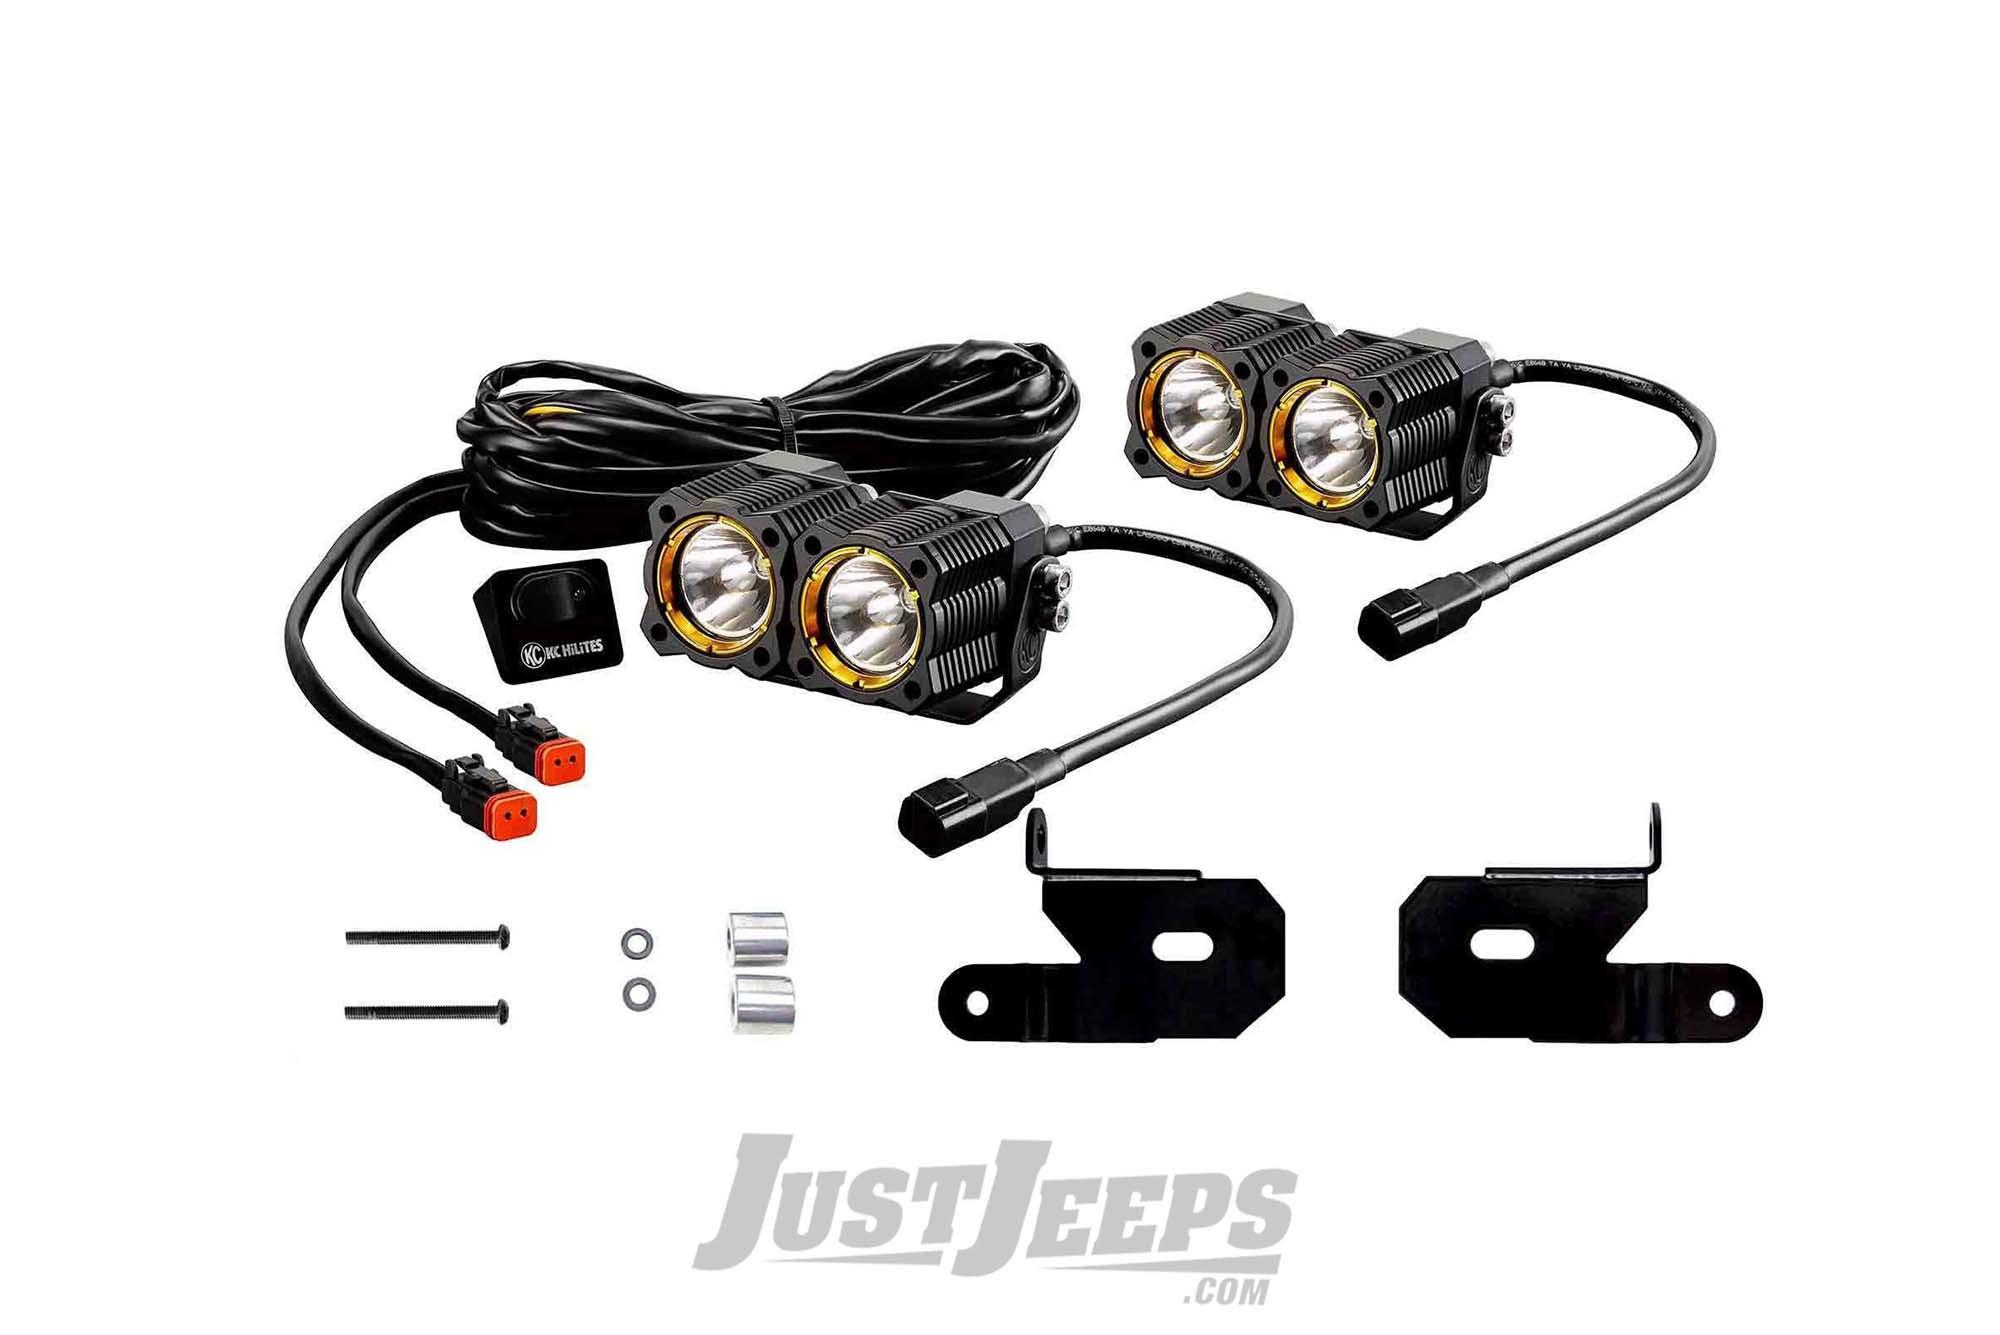 Just Jeeps Kc Hilites Spot Beam Flex Led Dual Led Lights